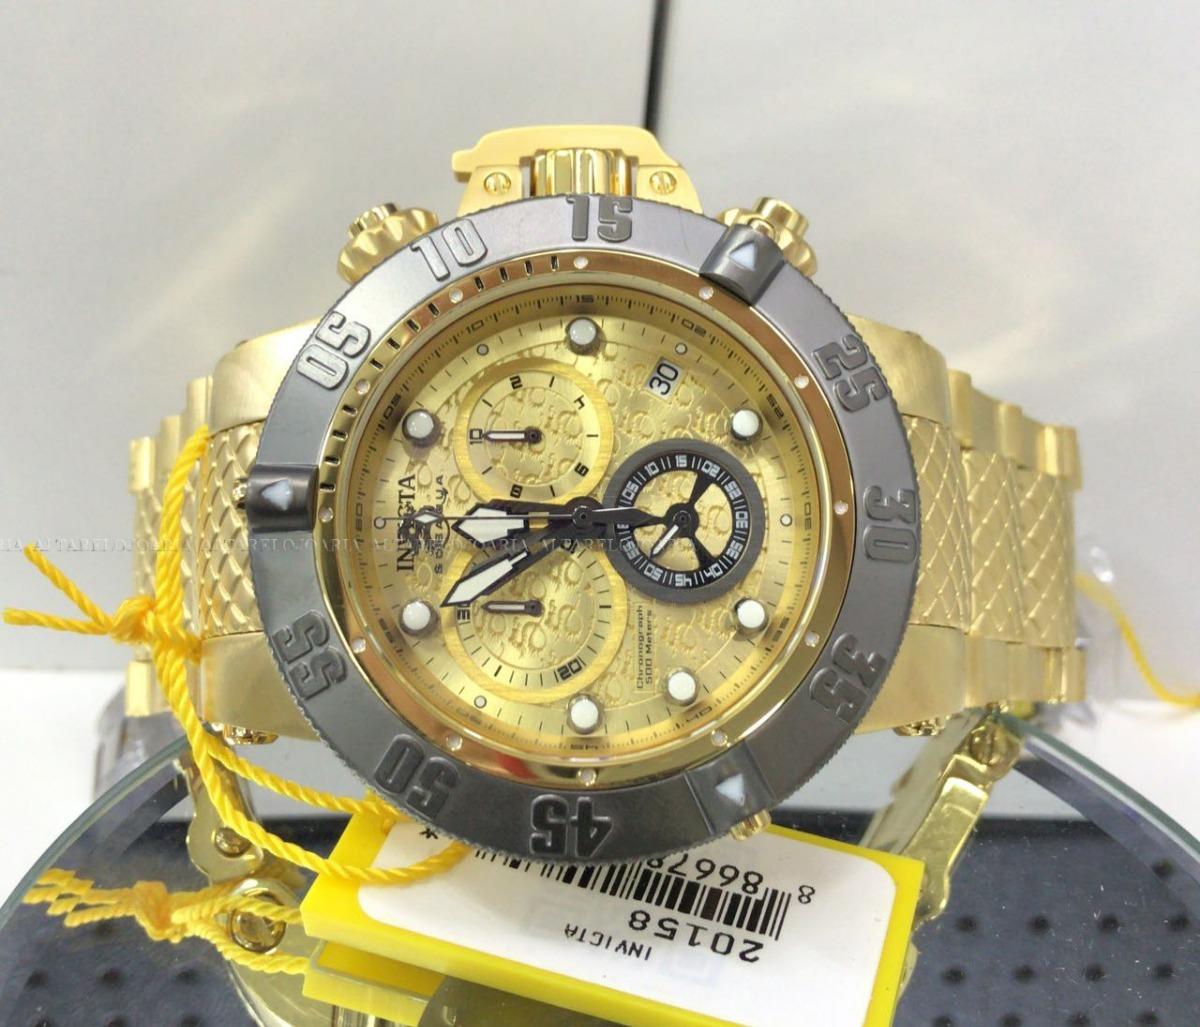 5637167bbd8 relógio masculino invicta subaqua 20158 plaque ouro suíço. Carregando zoom.